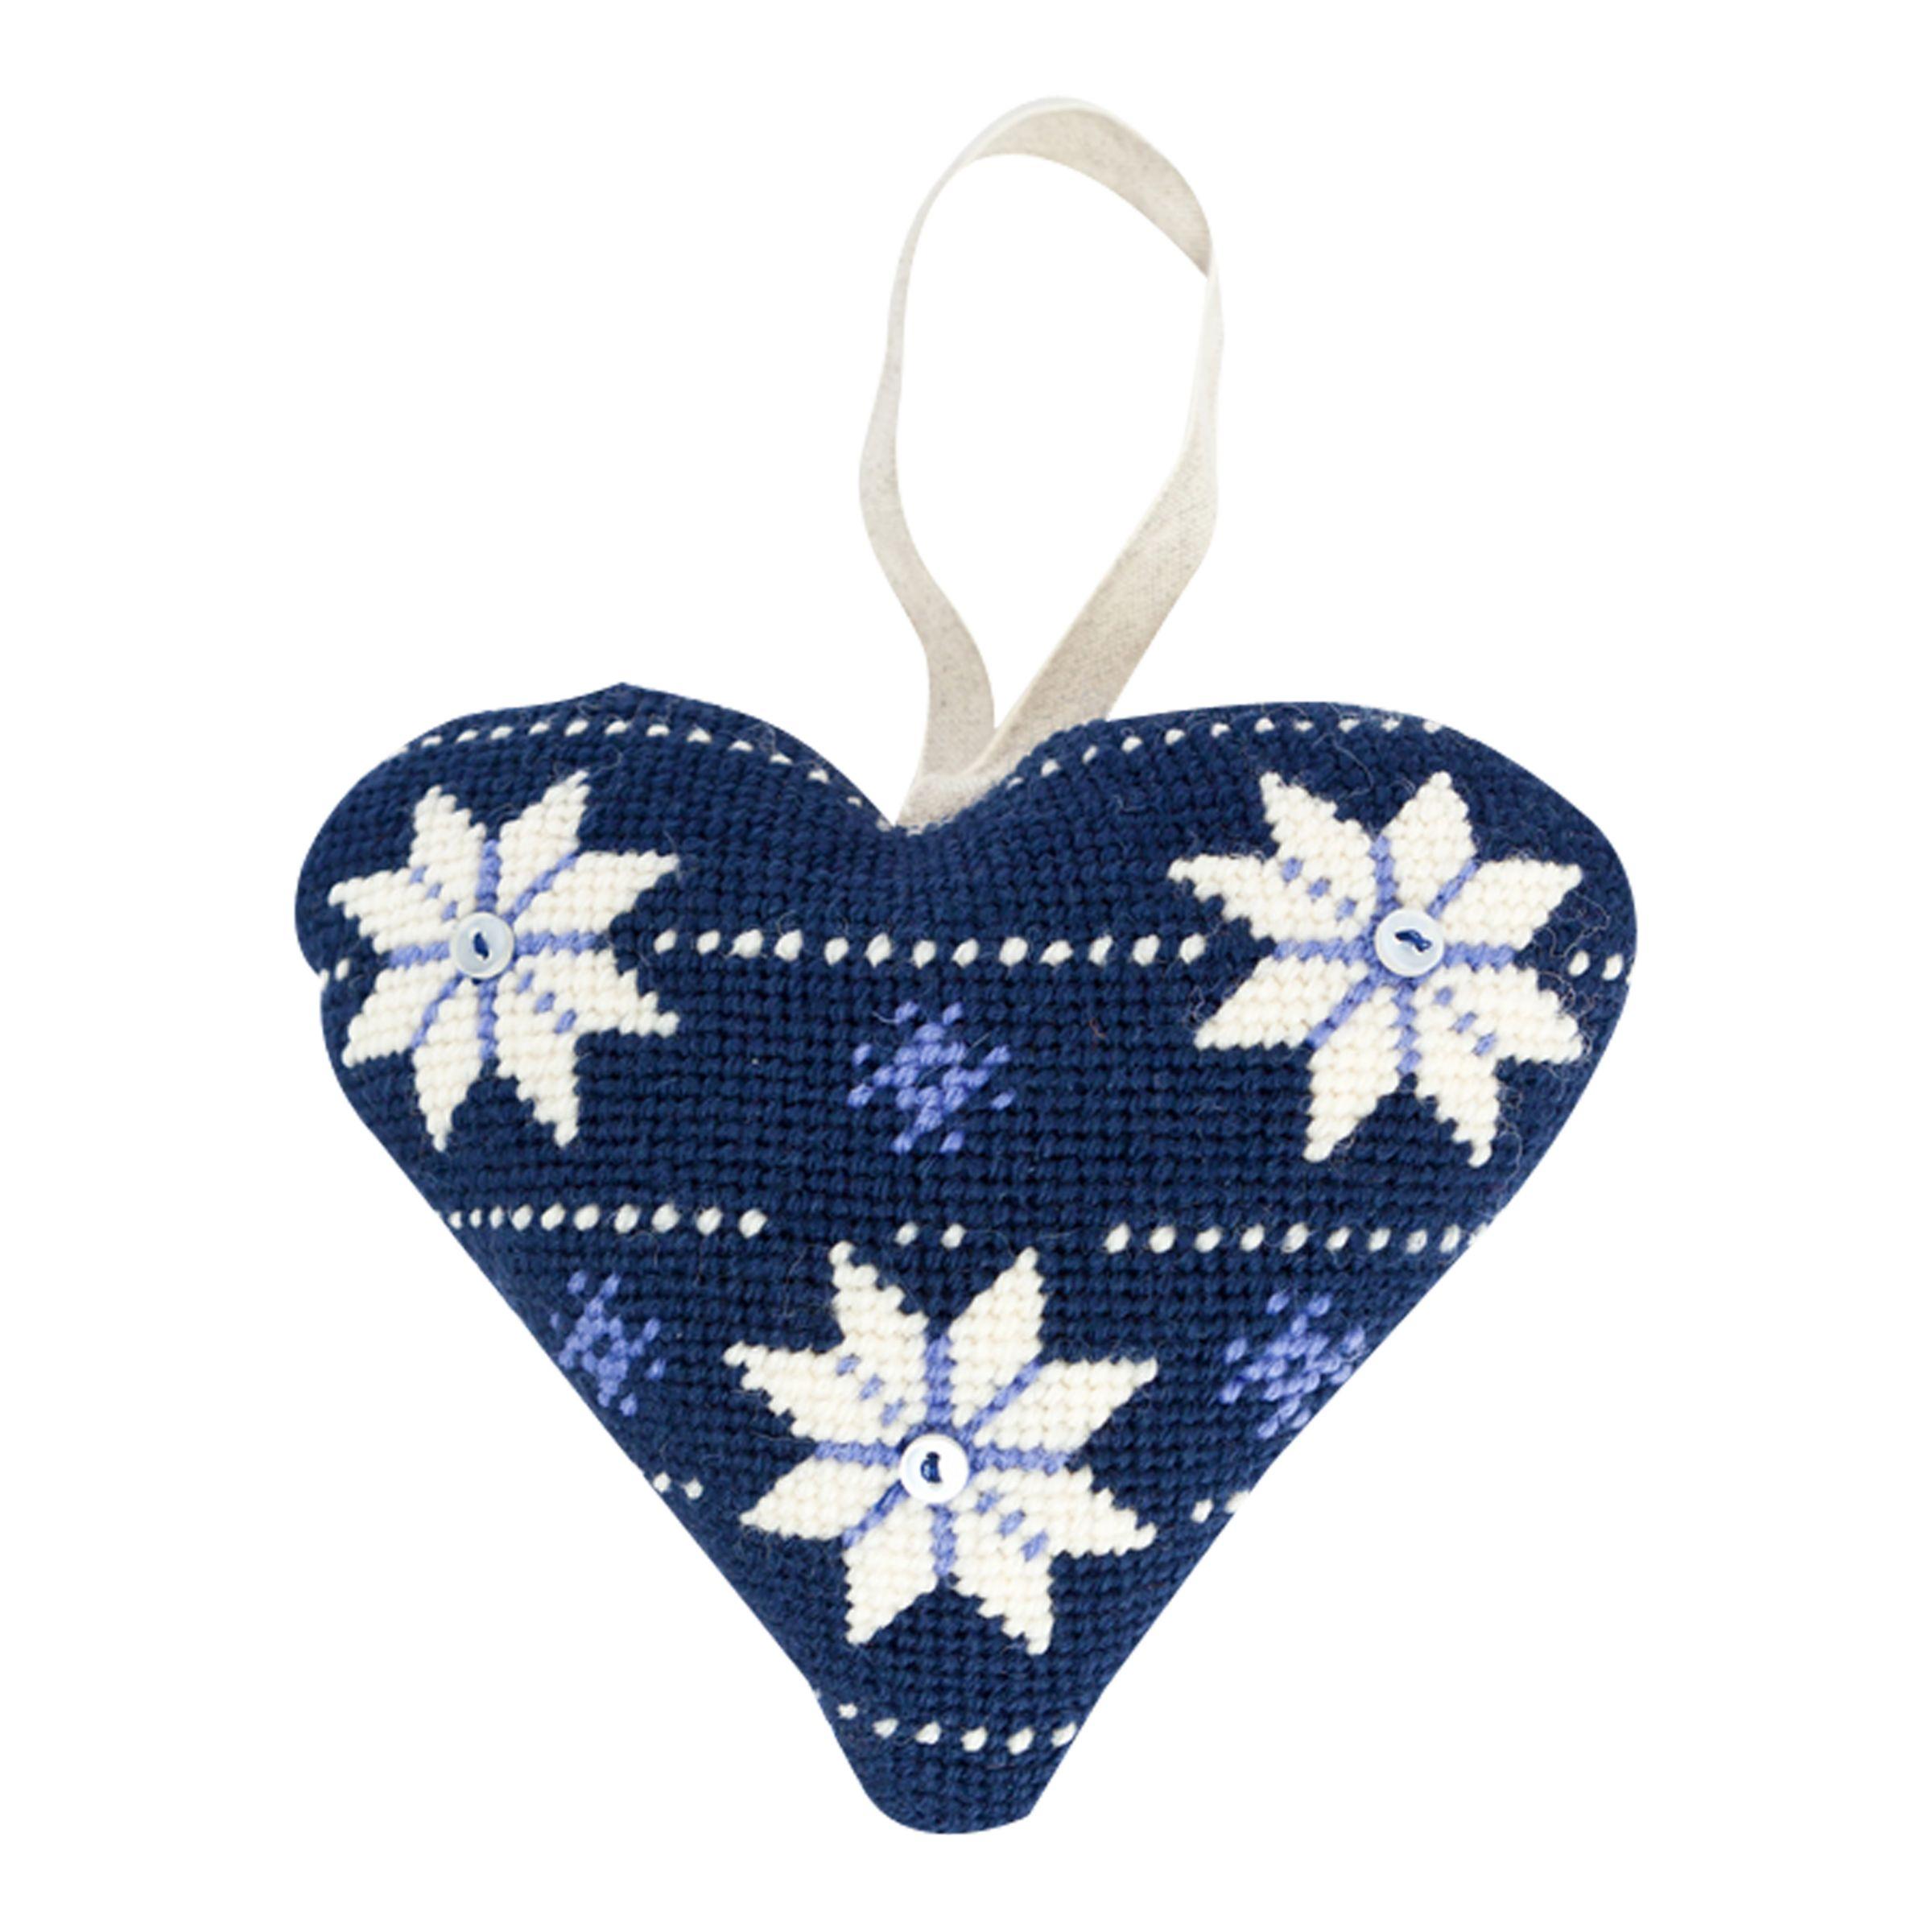 Cleopatra's Needle Cleopatra's Needle Lavender Heart Tapestry Kit, Scandinavian